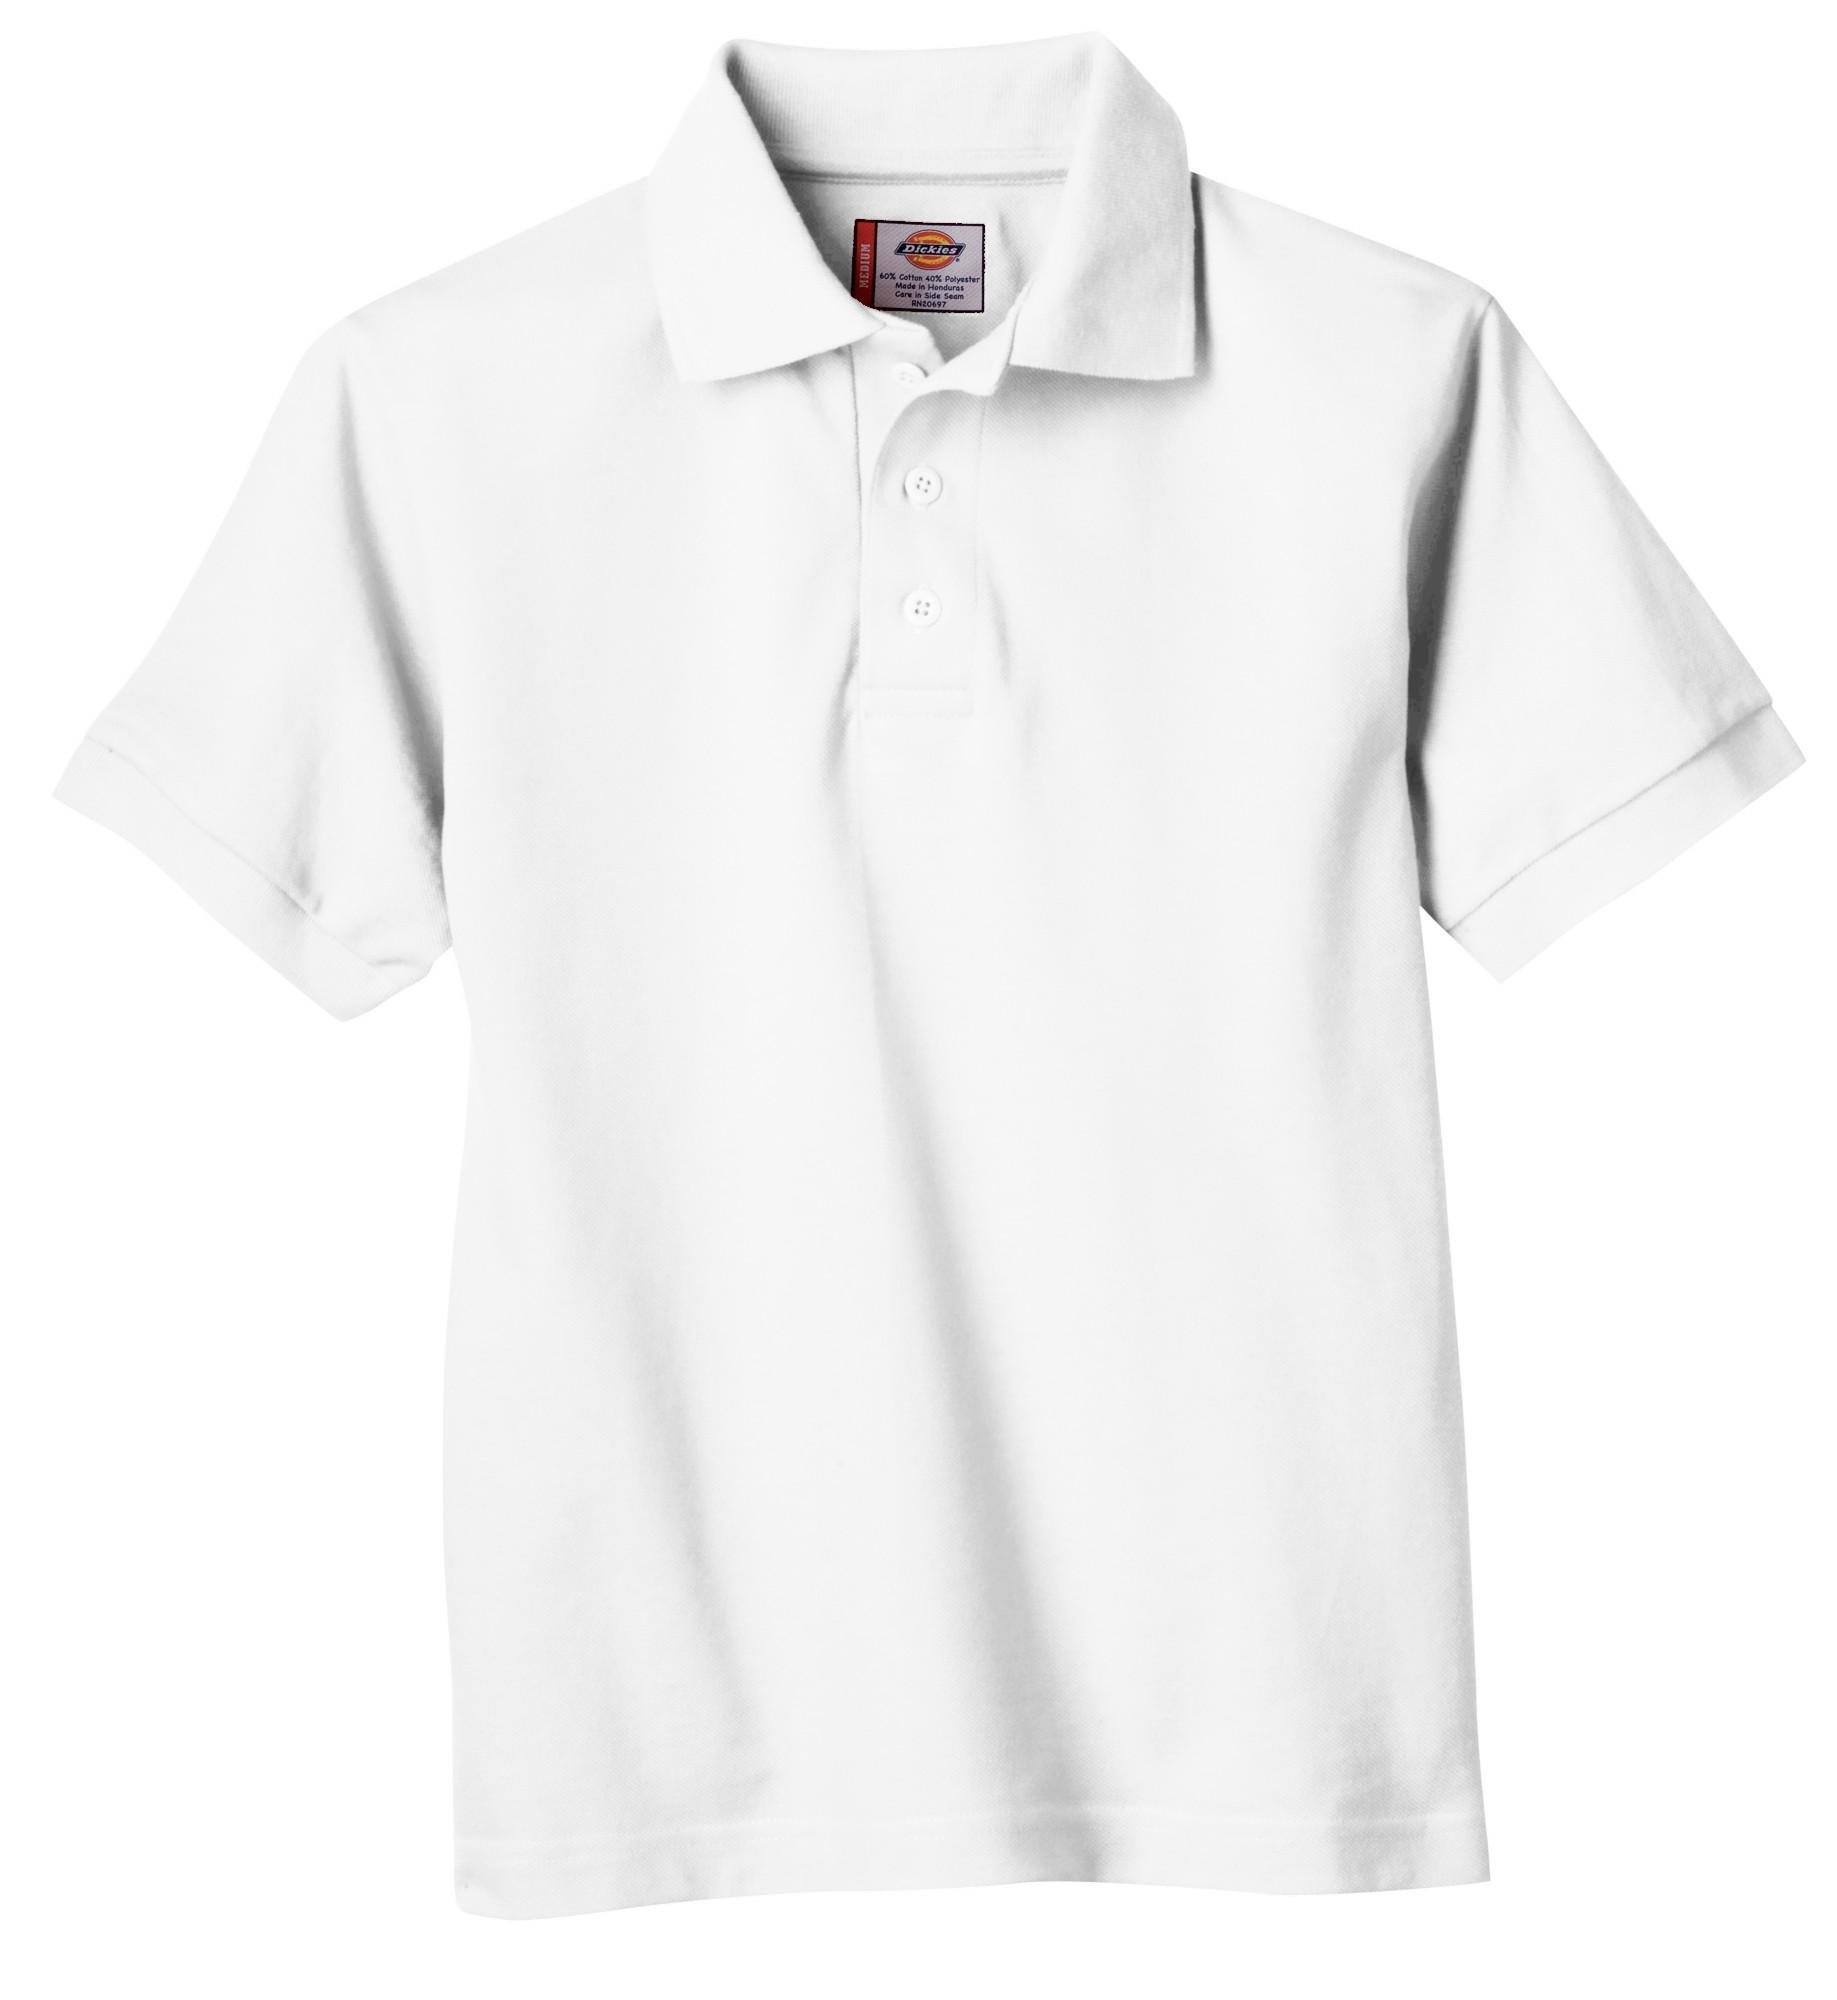 Dickies Big Boys' Short Sleeve Pique Polo Shirt, White, Medium (10/12)